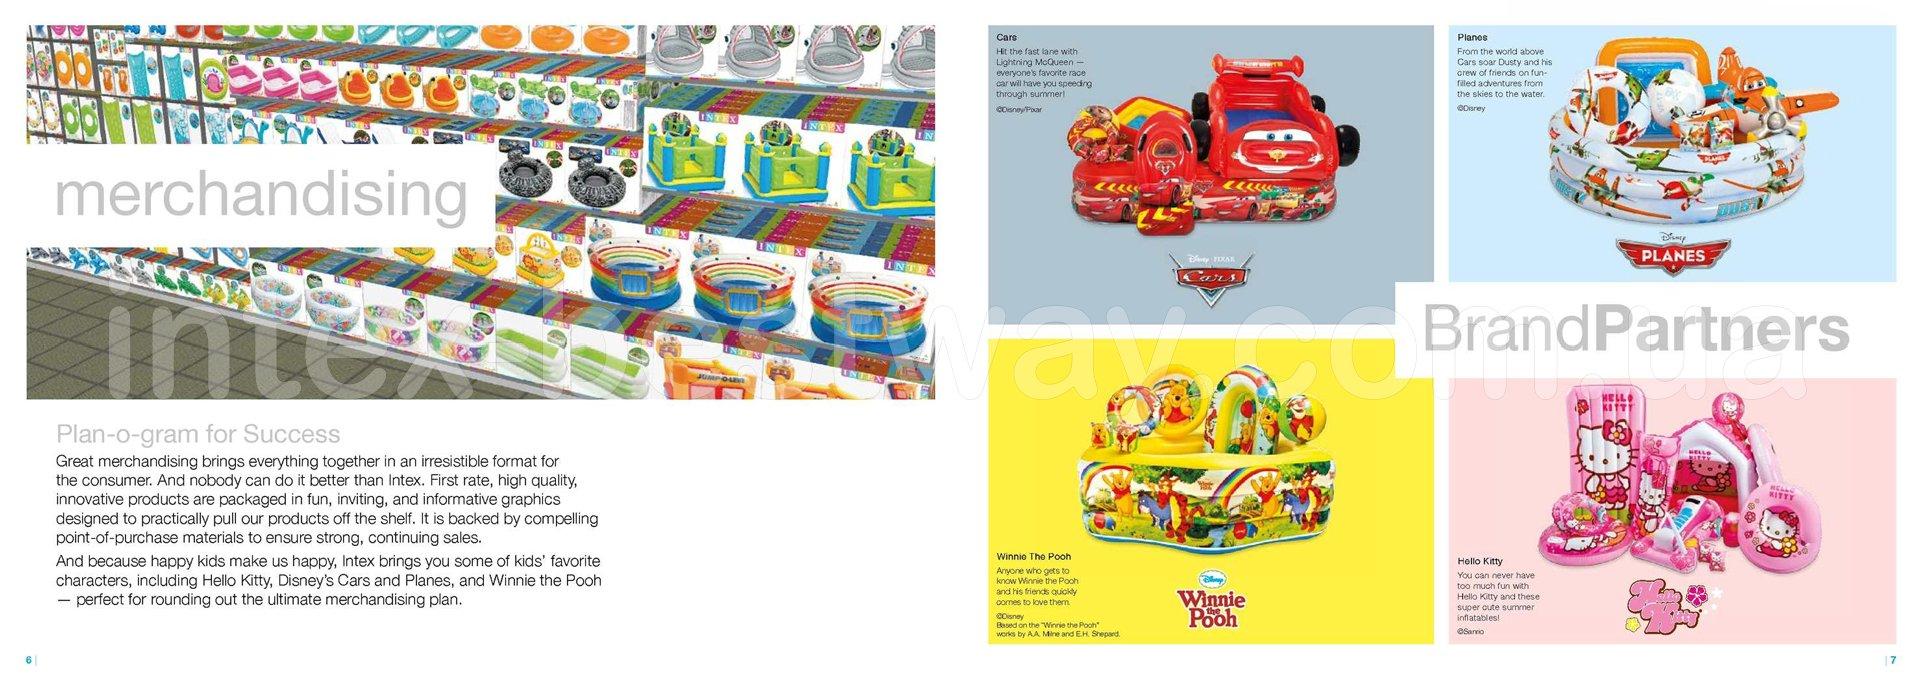 "Серии надувных изделий Intex: Король Лев ""The Lion King"", История Игрушек ""ToY Story"", Винни Пух ""Winnie The Pooh"", Hello Kitty, Тачки ""Cars"", Литачки ""Planes""."